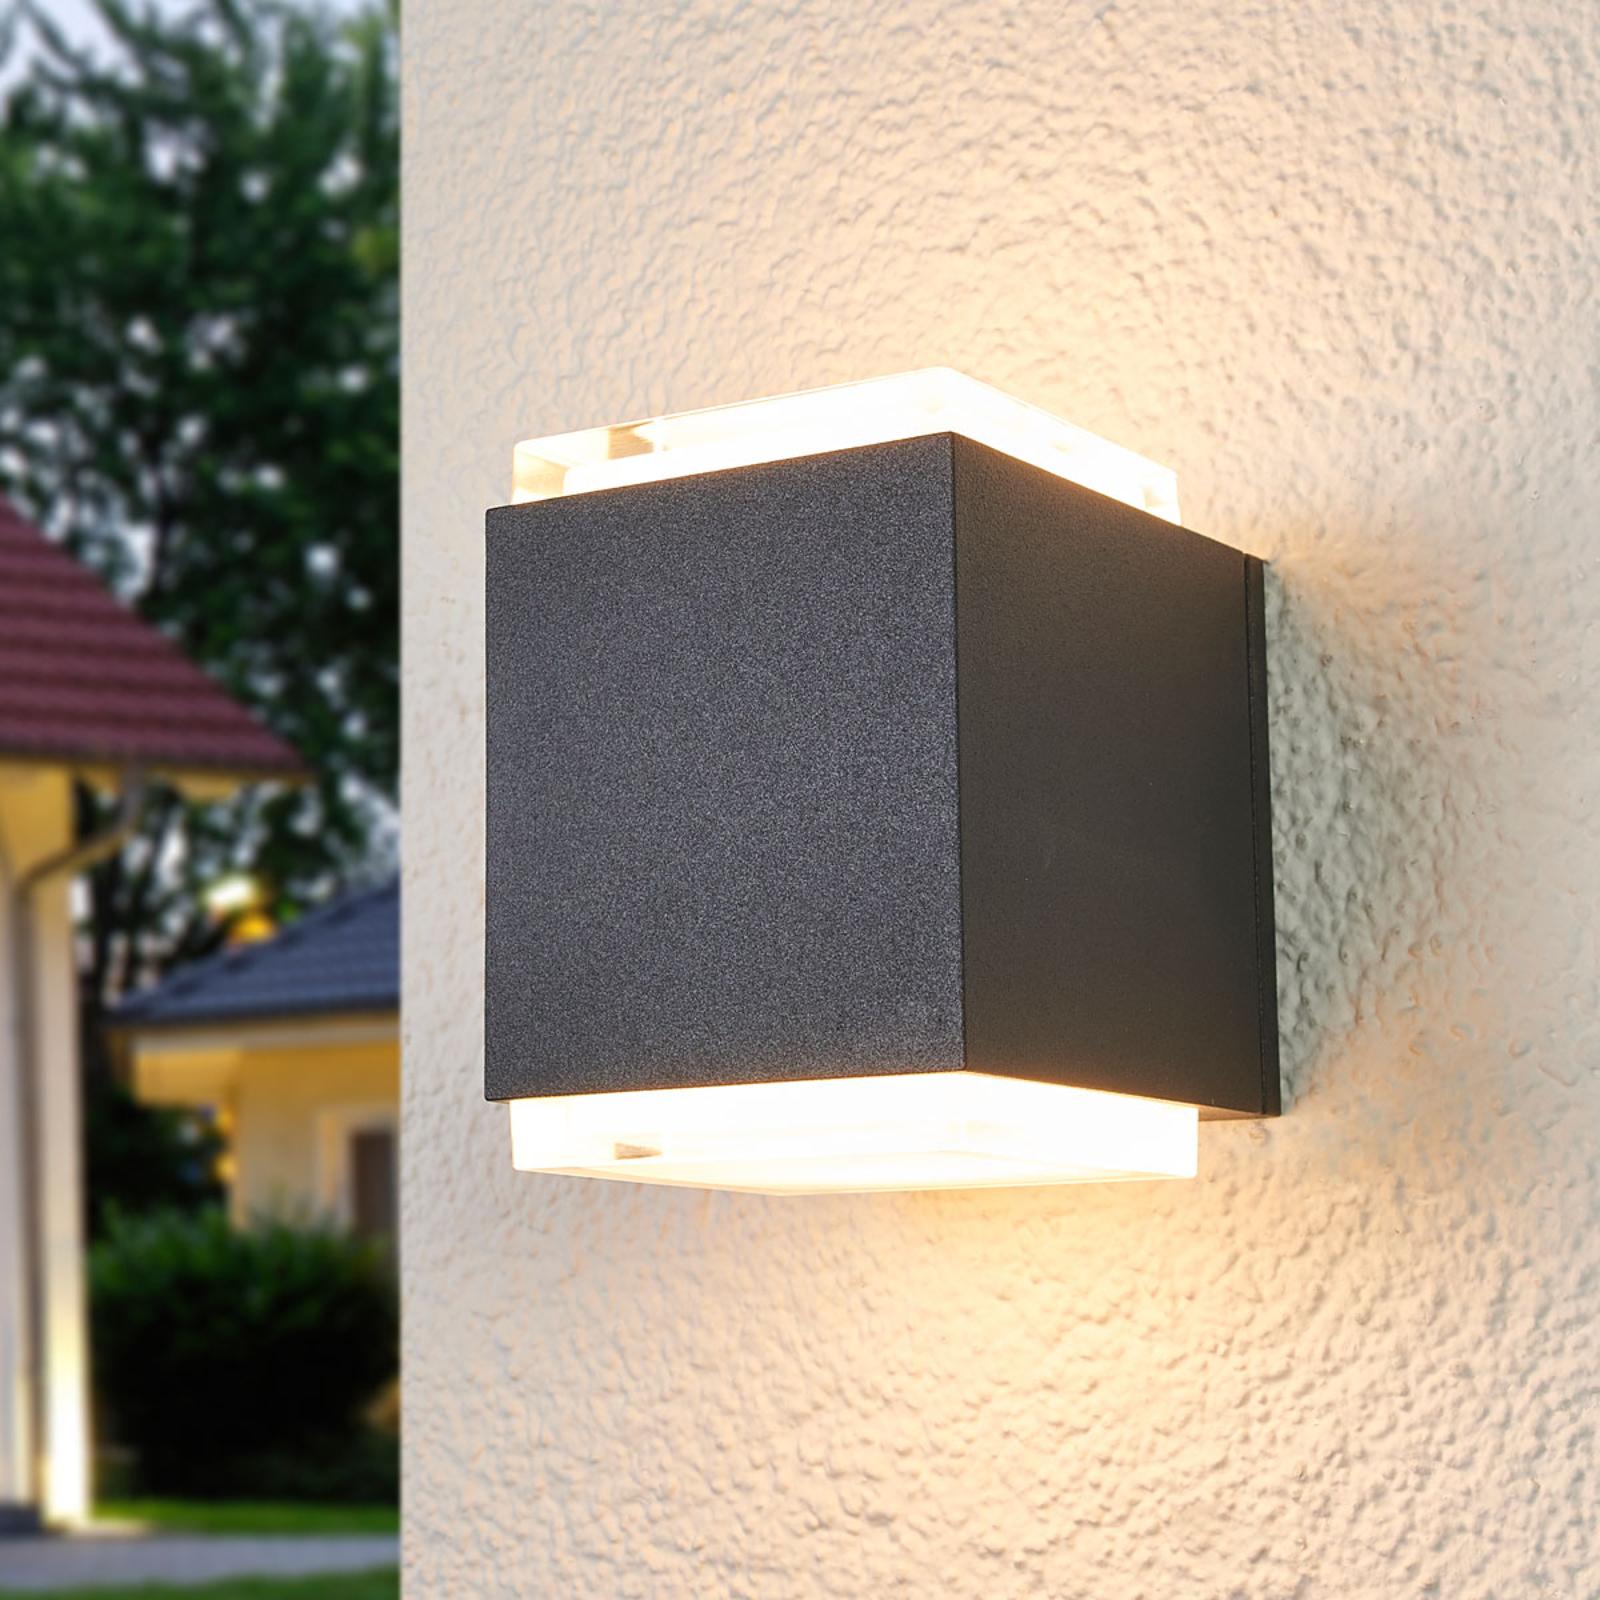 BEGA 33505K3 Außenwandlampe grafit 3.000K up/down